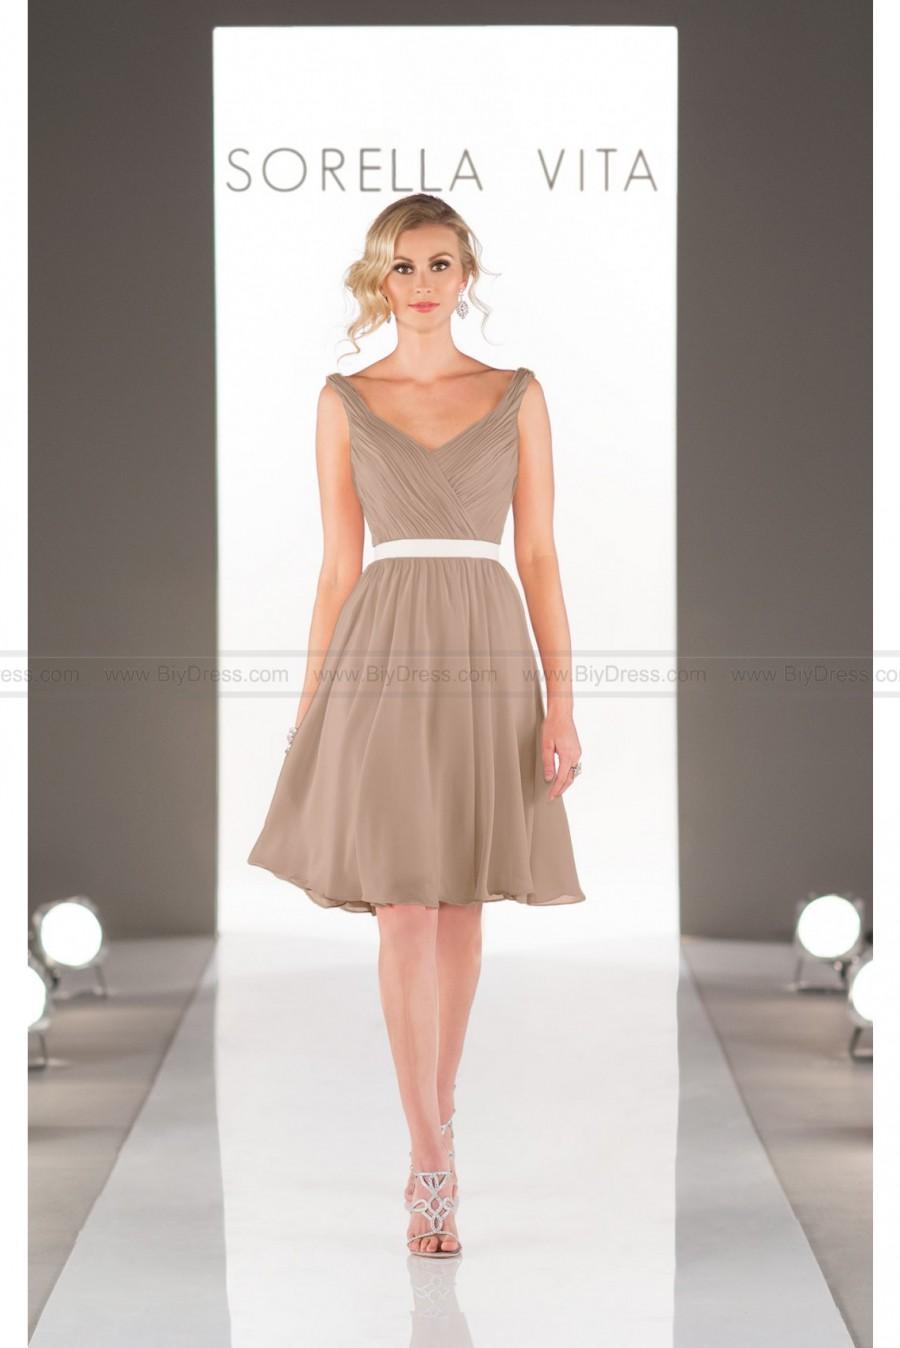 Wedding - Sorella Vita Short Bridesmaid Dress Style 8508